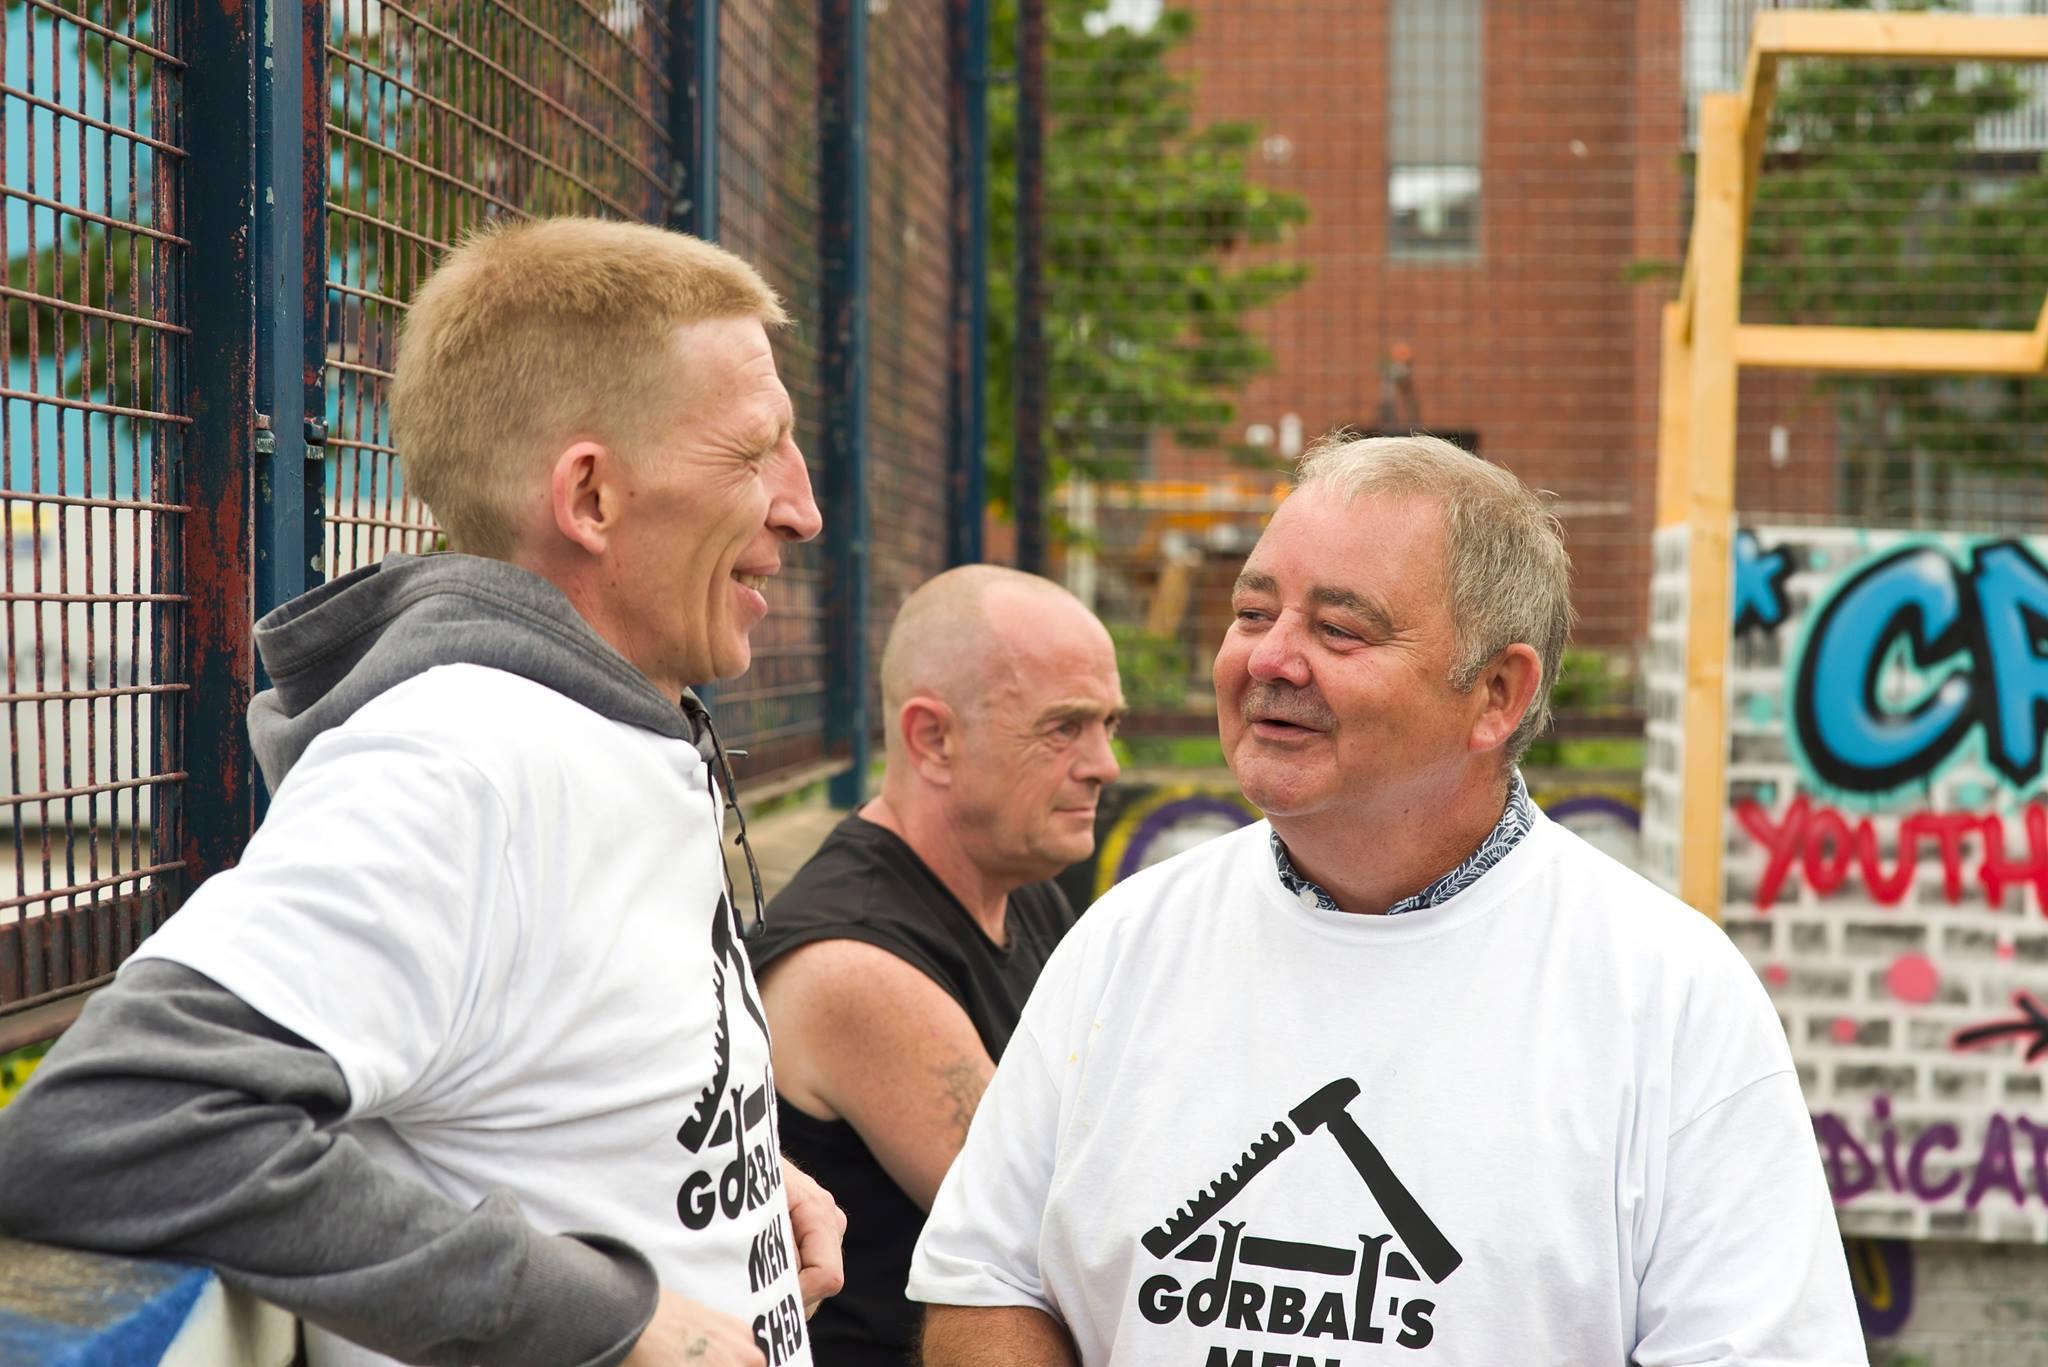 Gorbals idea fund 2019 men.jpg